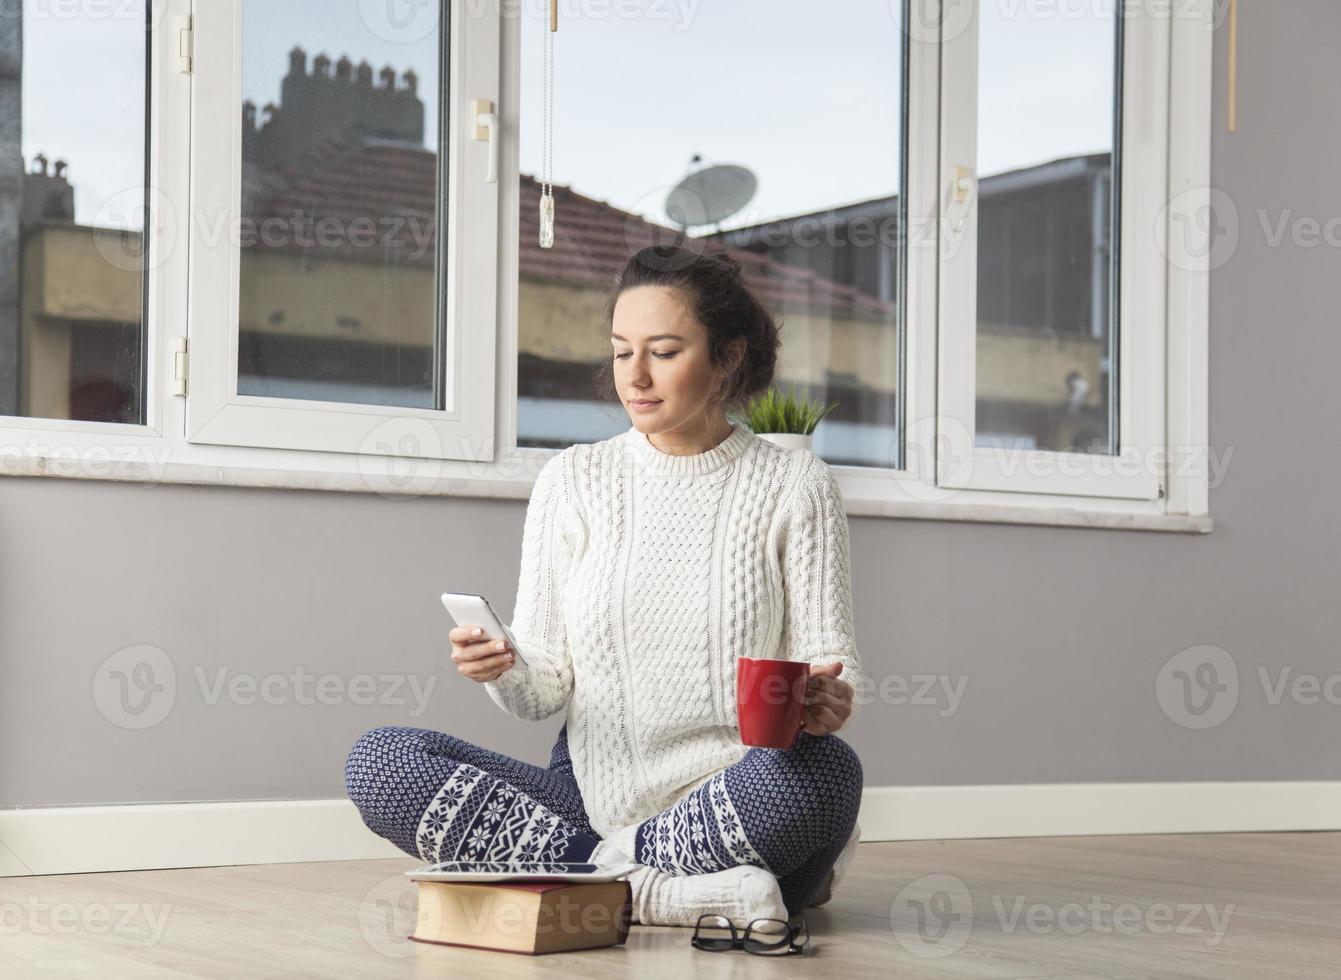 jeune femme, envoyer message texte photo